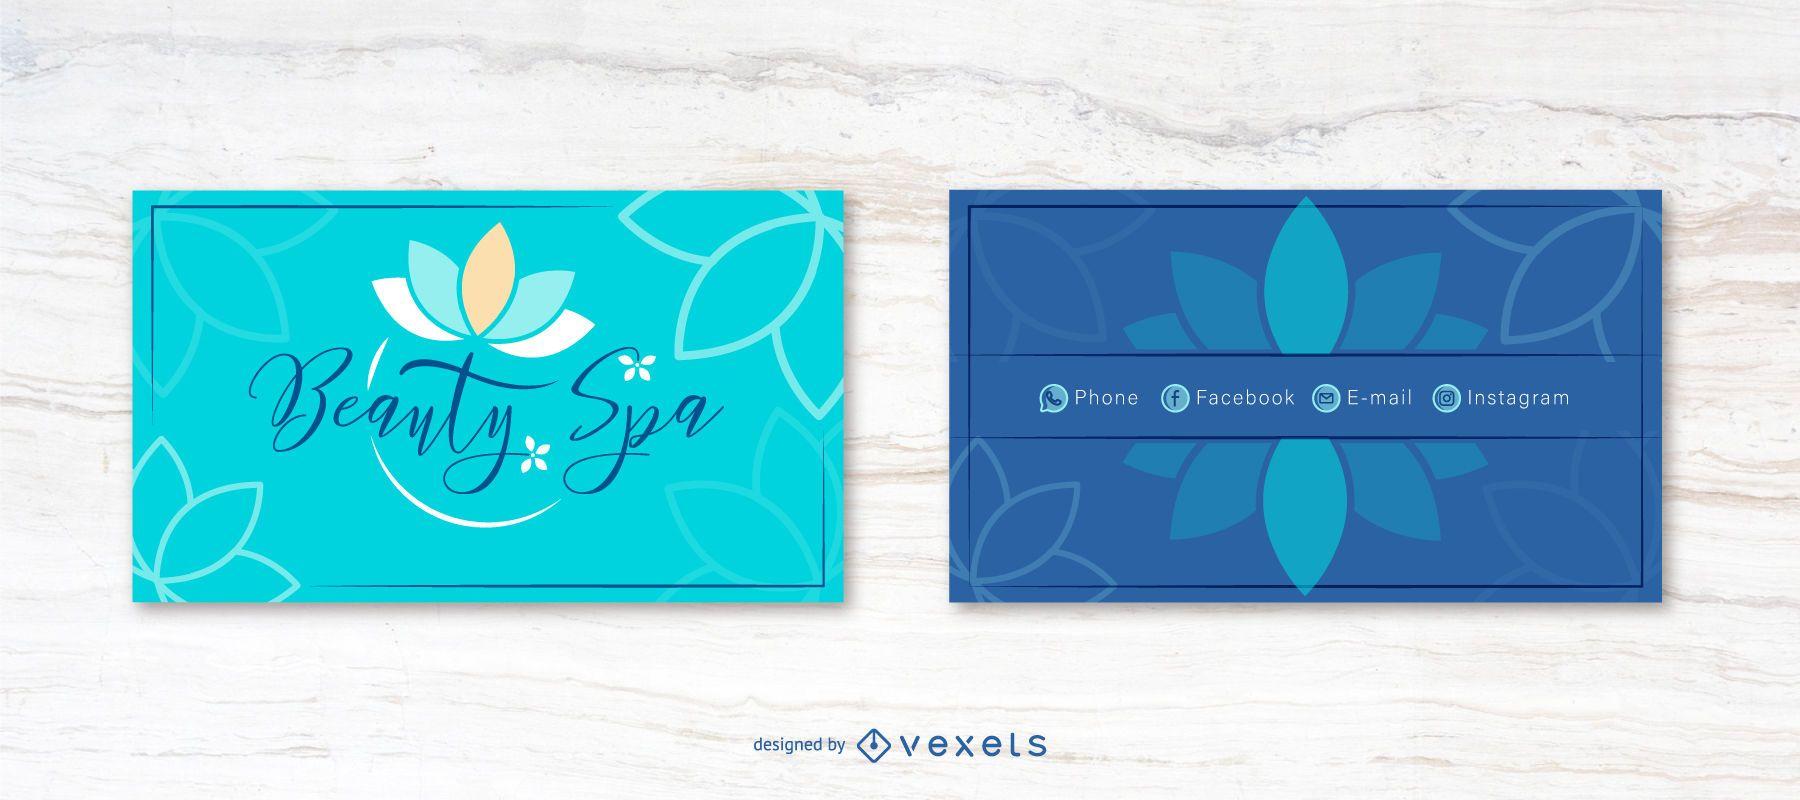 Beauty Spa Visitenkarten Design Vektor Download